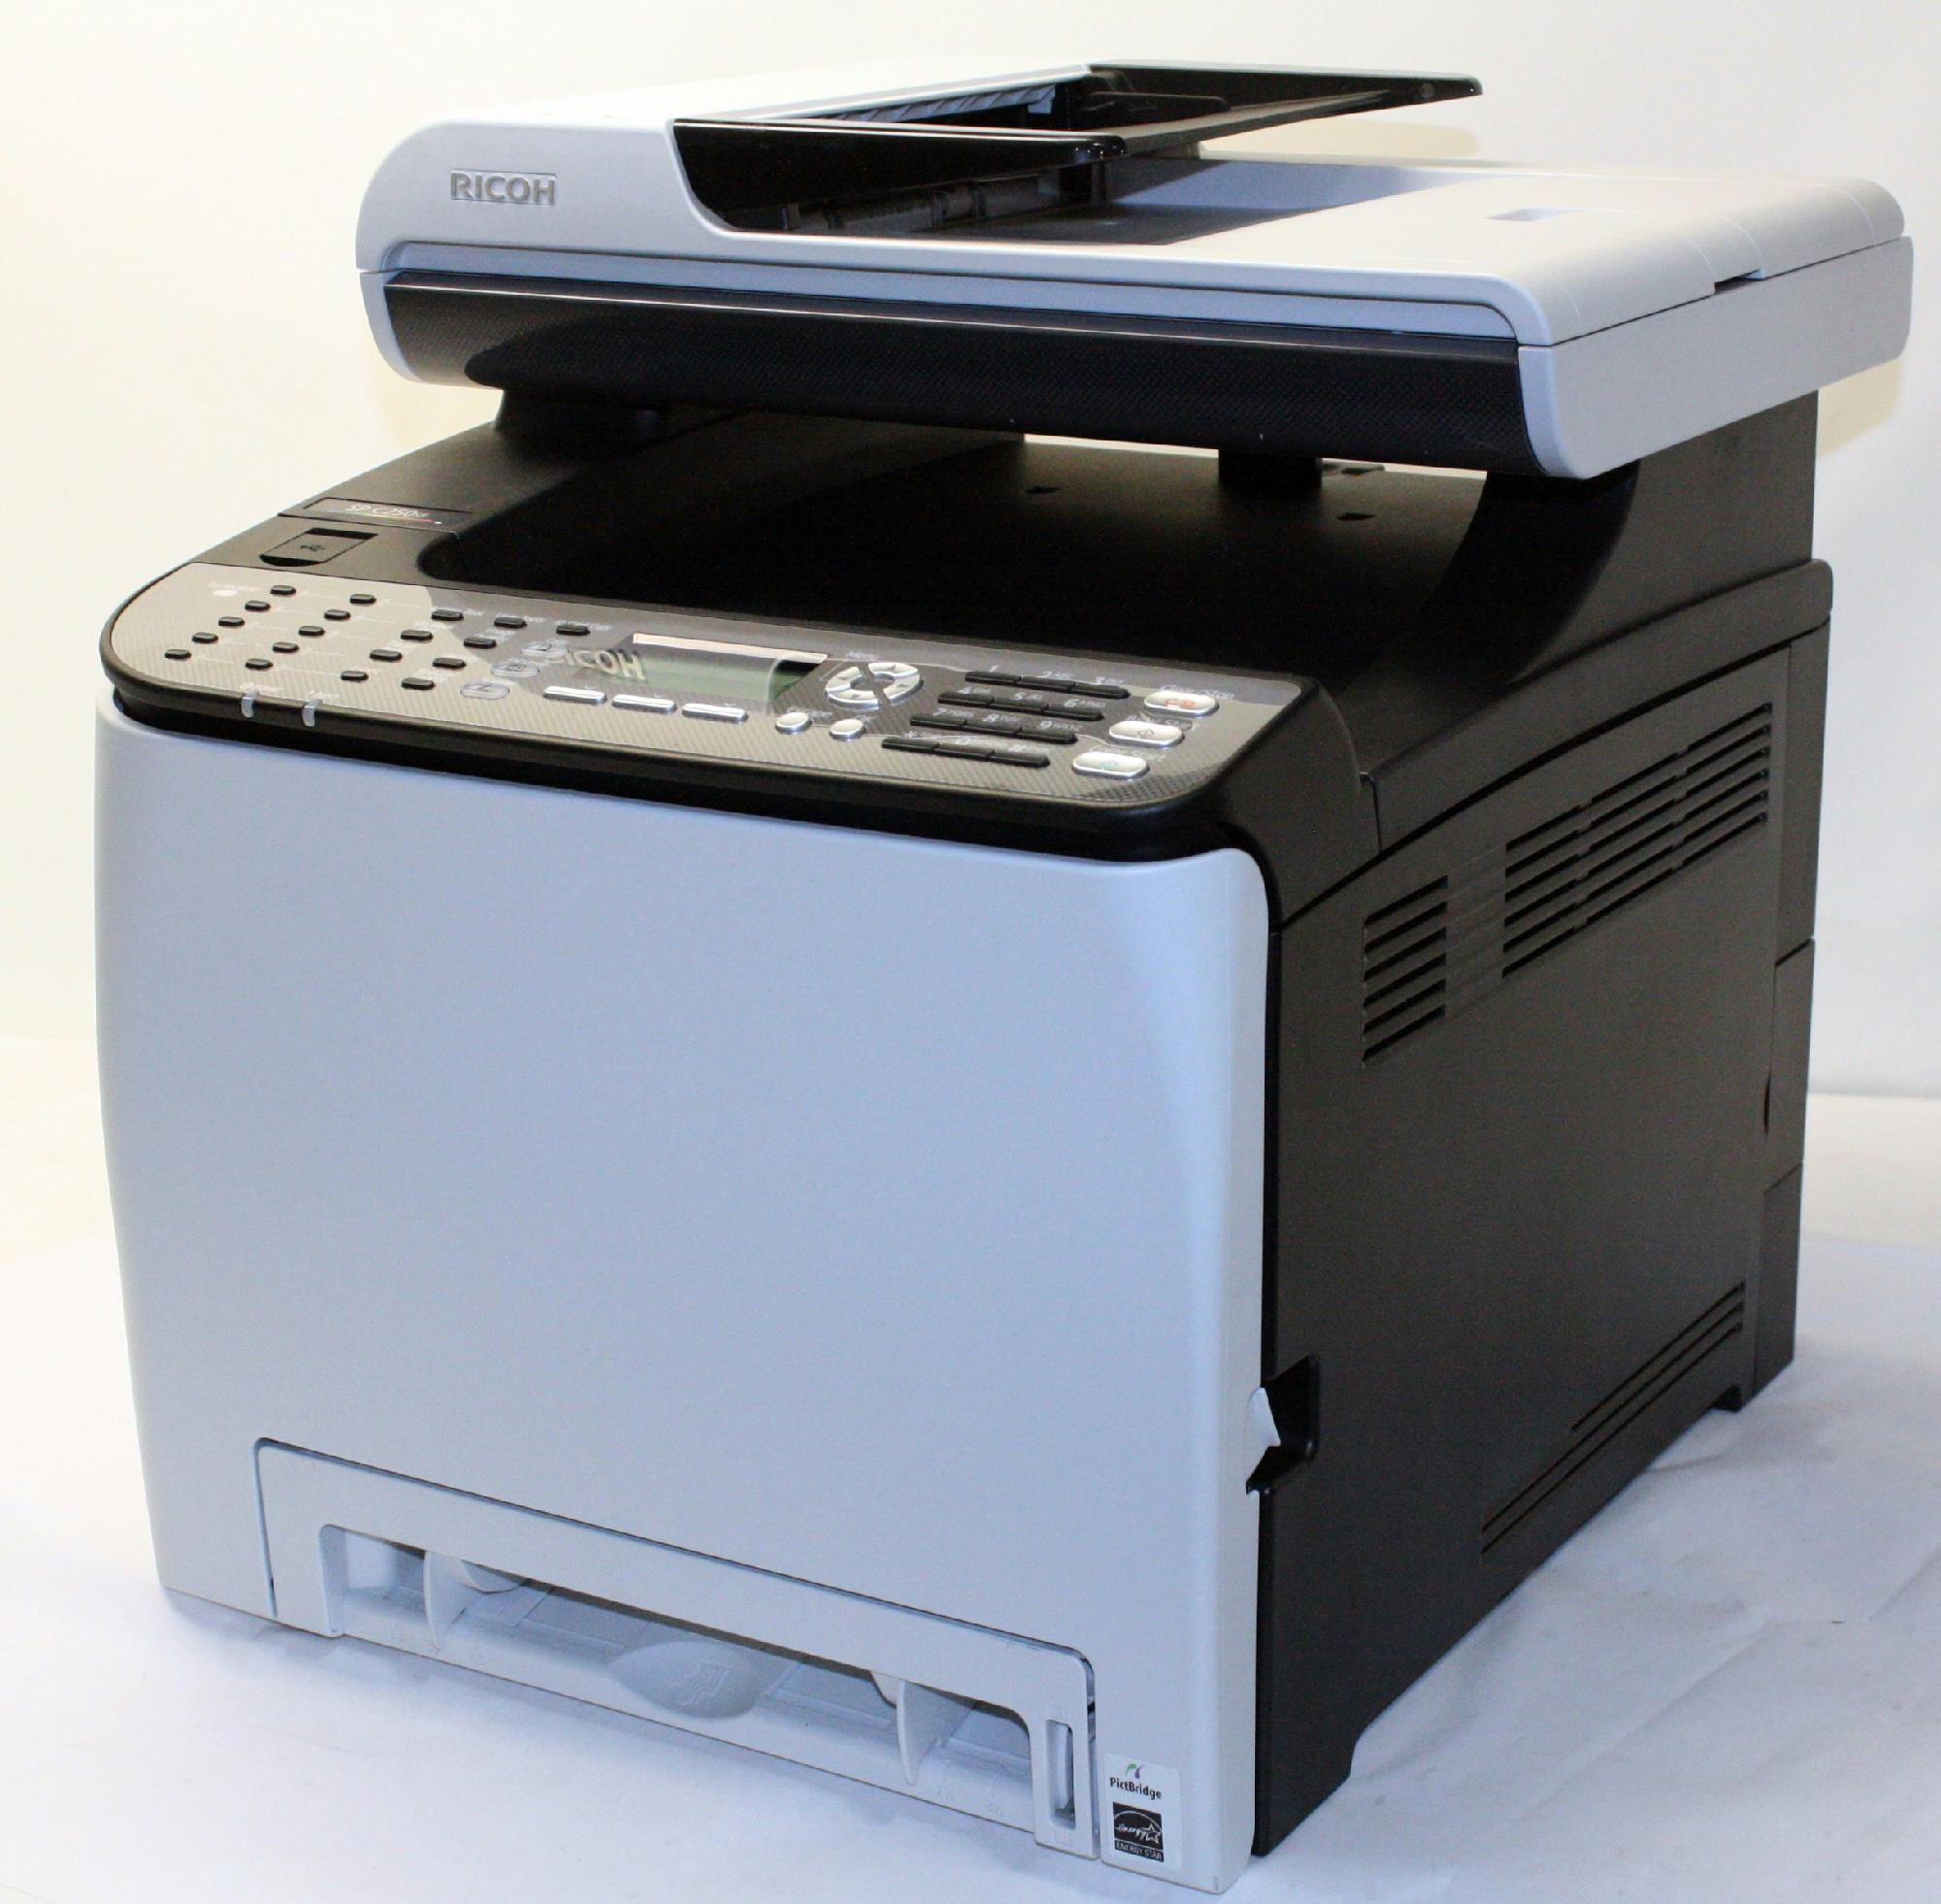 Color wireless printer laser - Ricoh Sp C250sf Color Laser Multifunction Printer 407523 For Parts 800129710